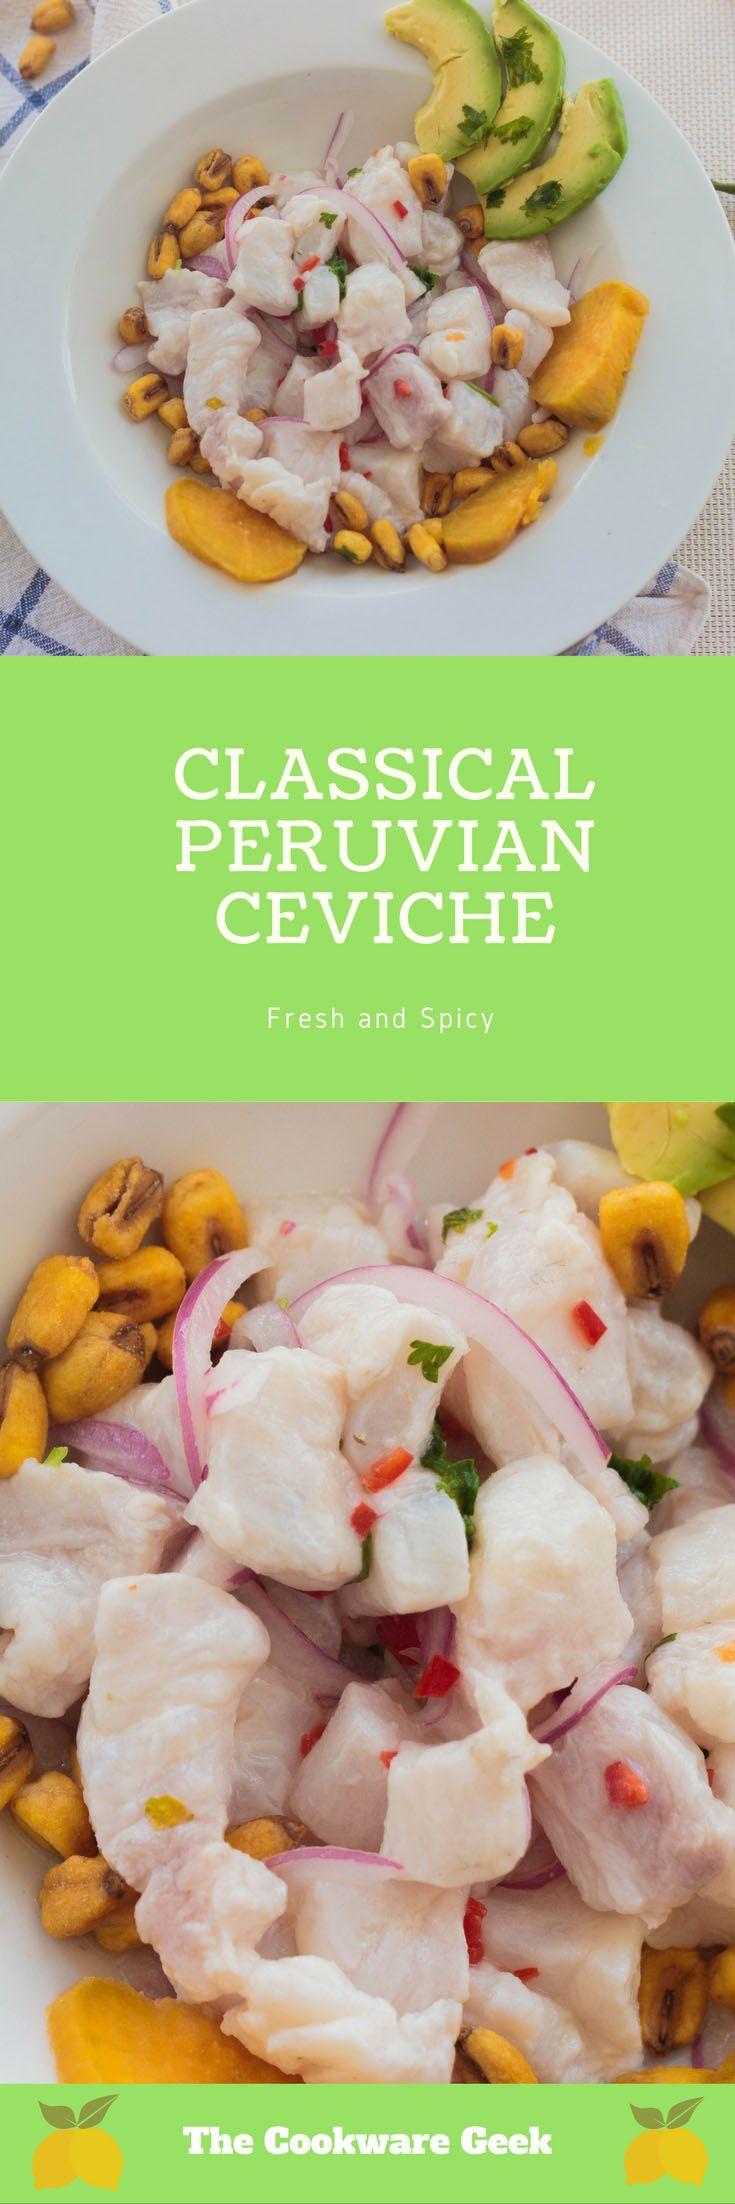 Classical Peruvian Ceviche | The Cookware Geek